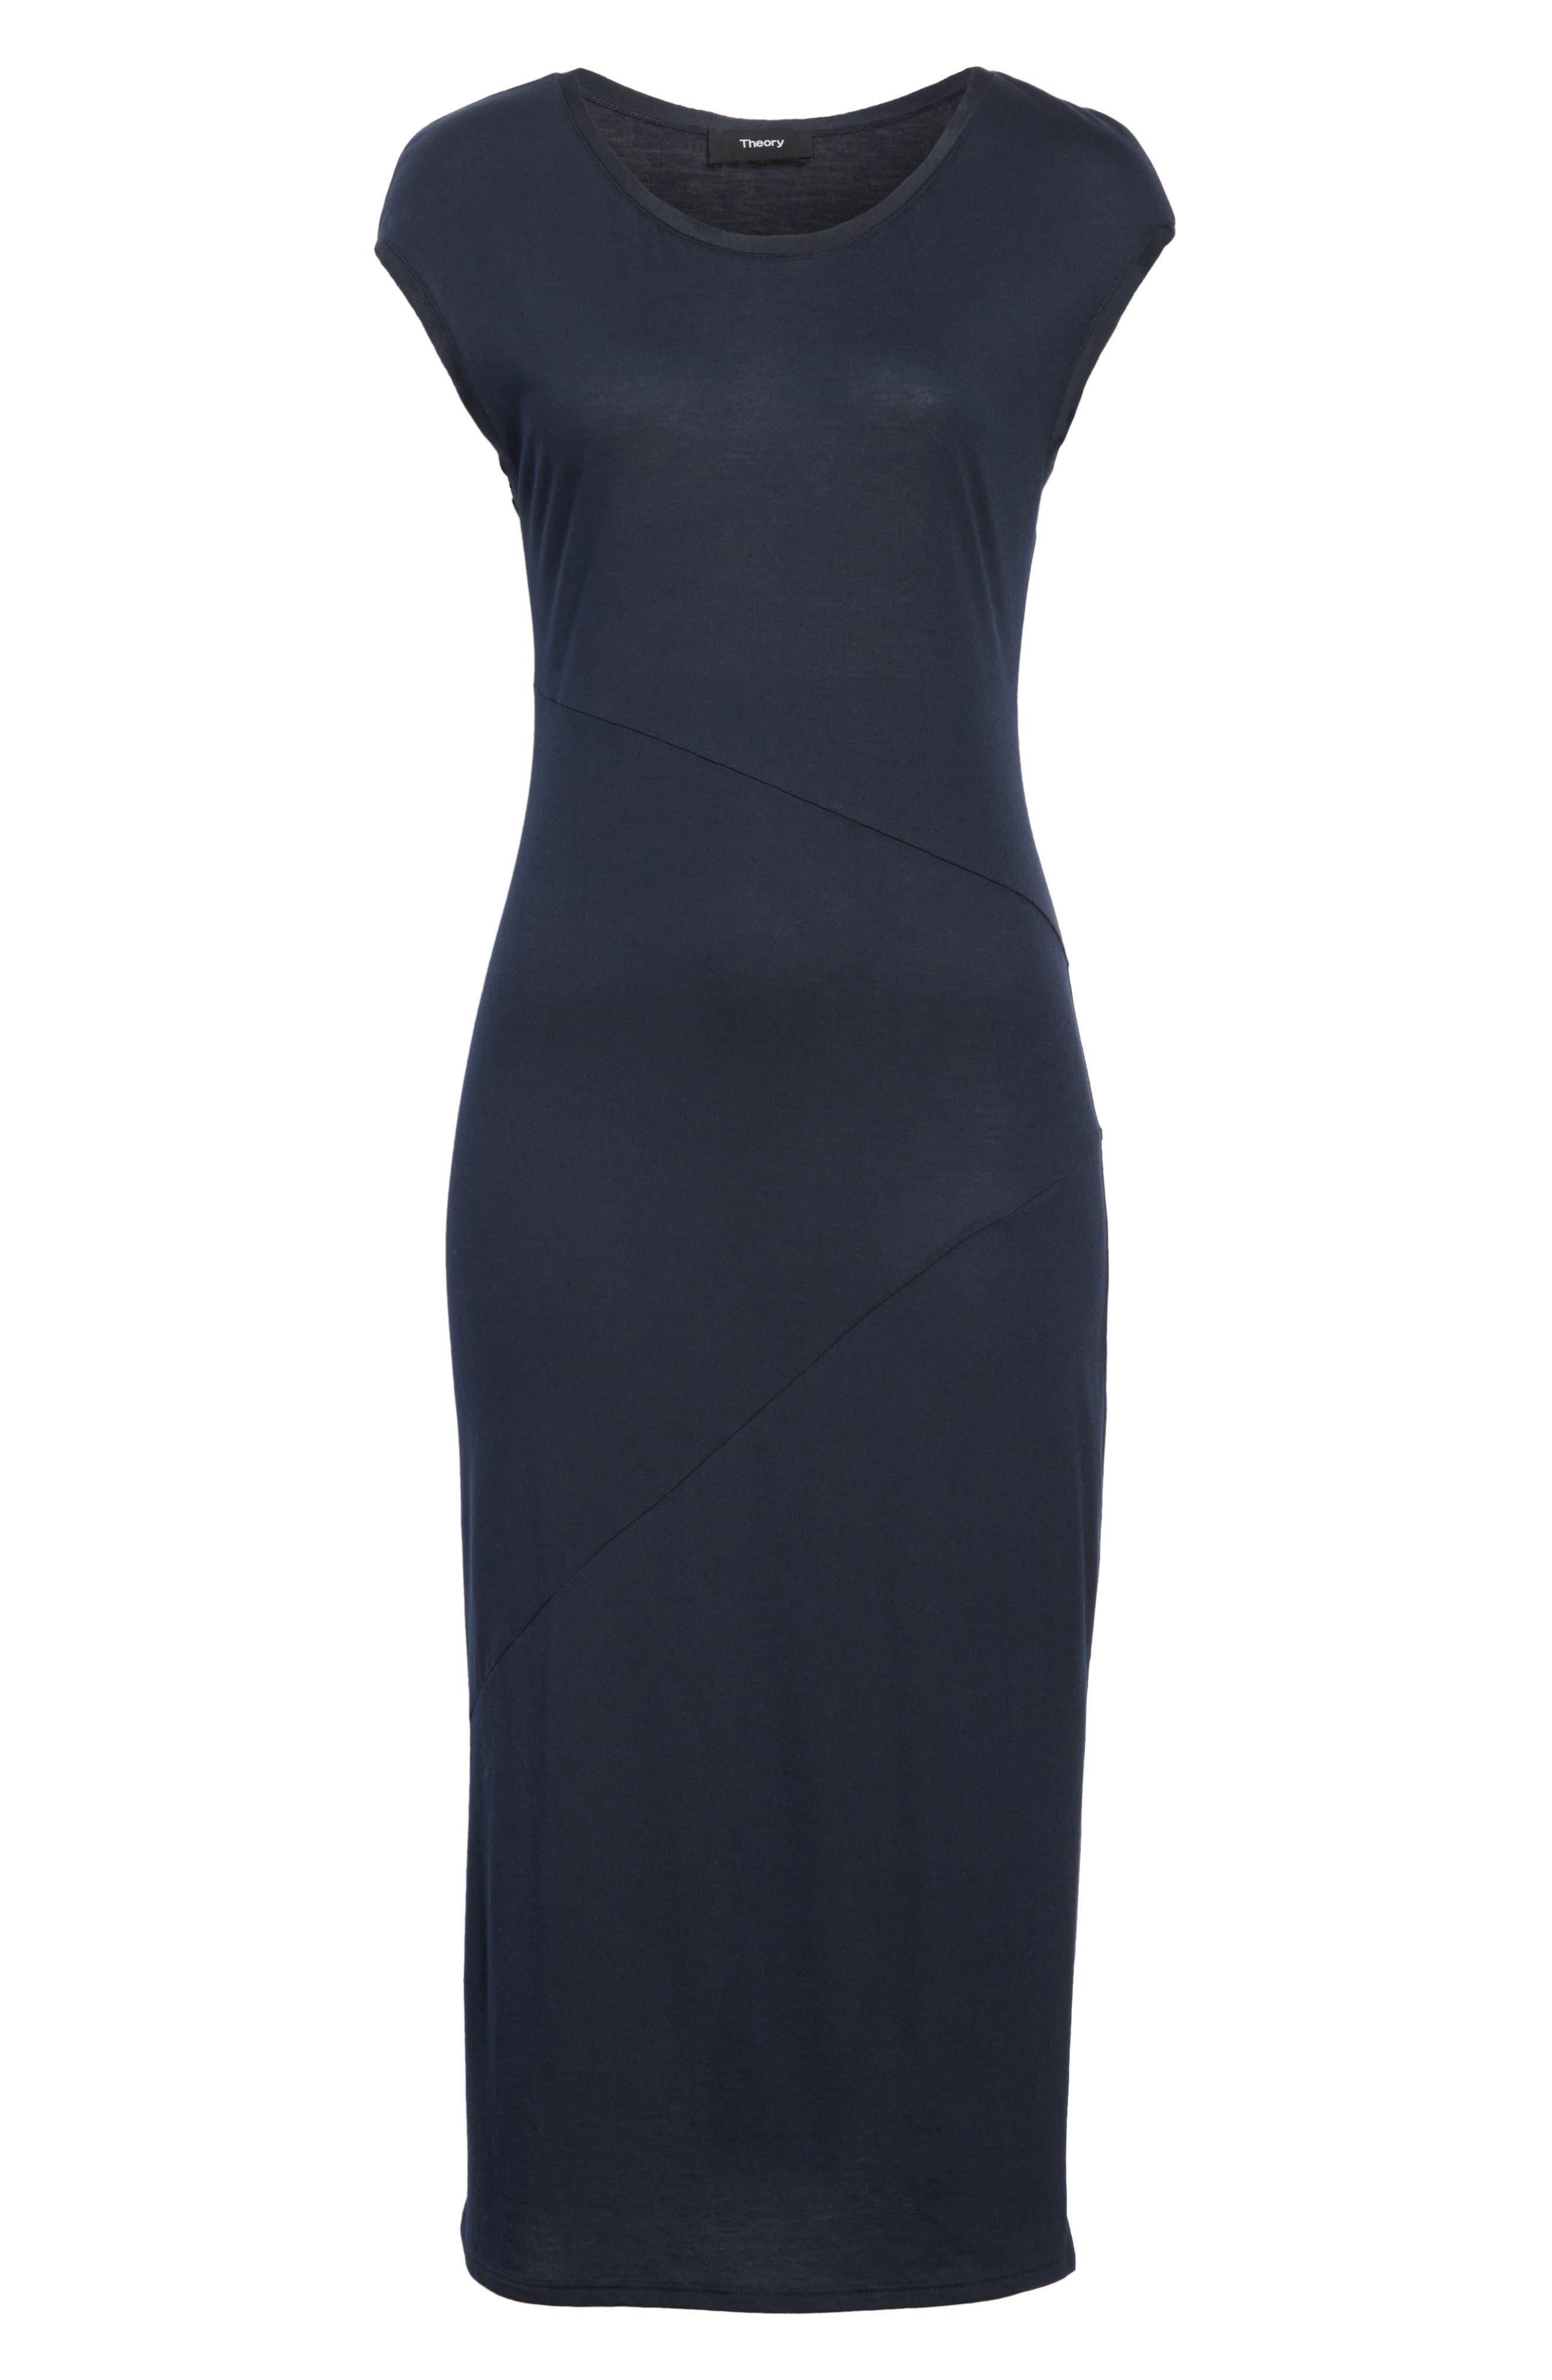 Plume Seamed Cotton Blend Jersey Dress,                             Alternate thumbnail 6, color,                             491